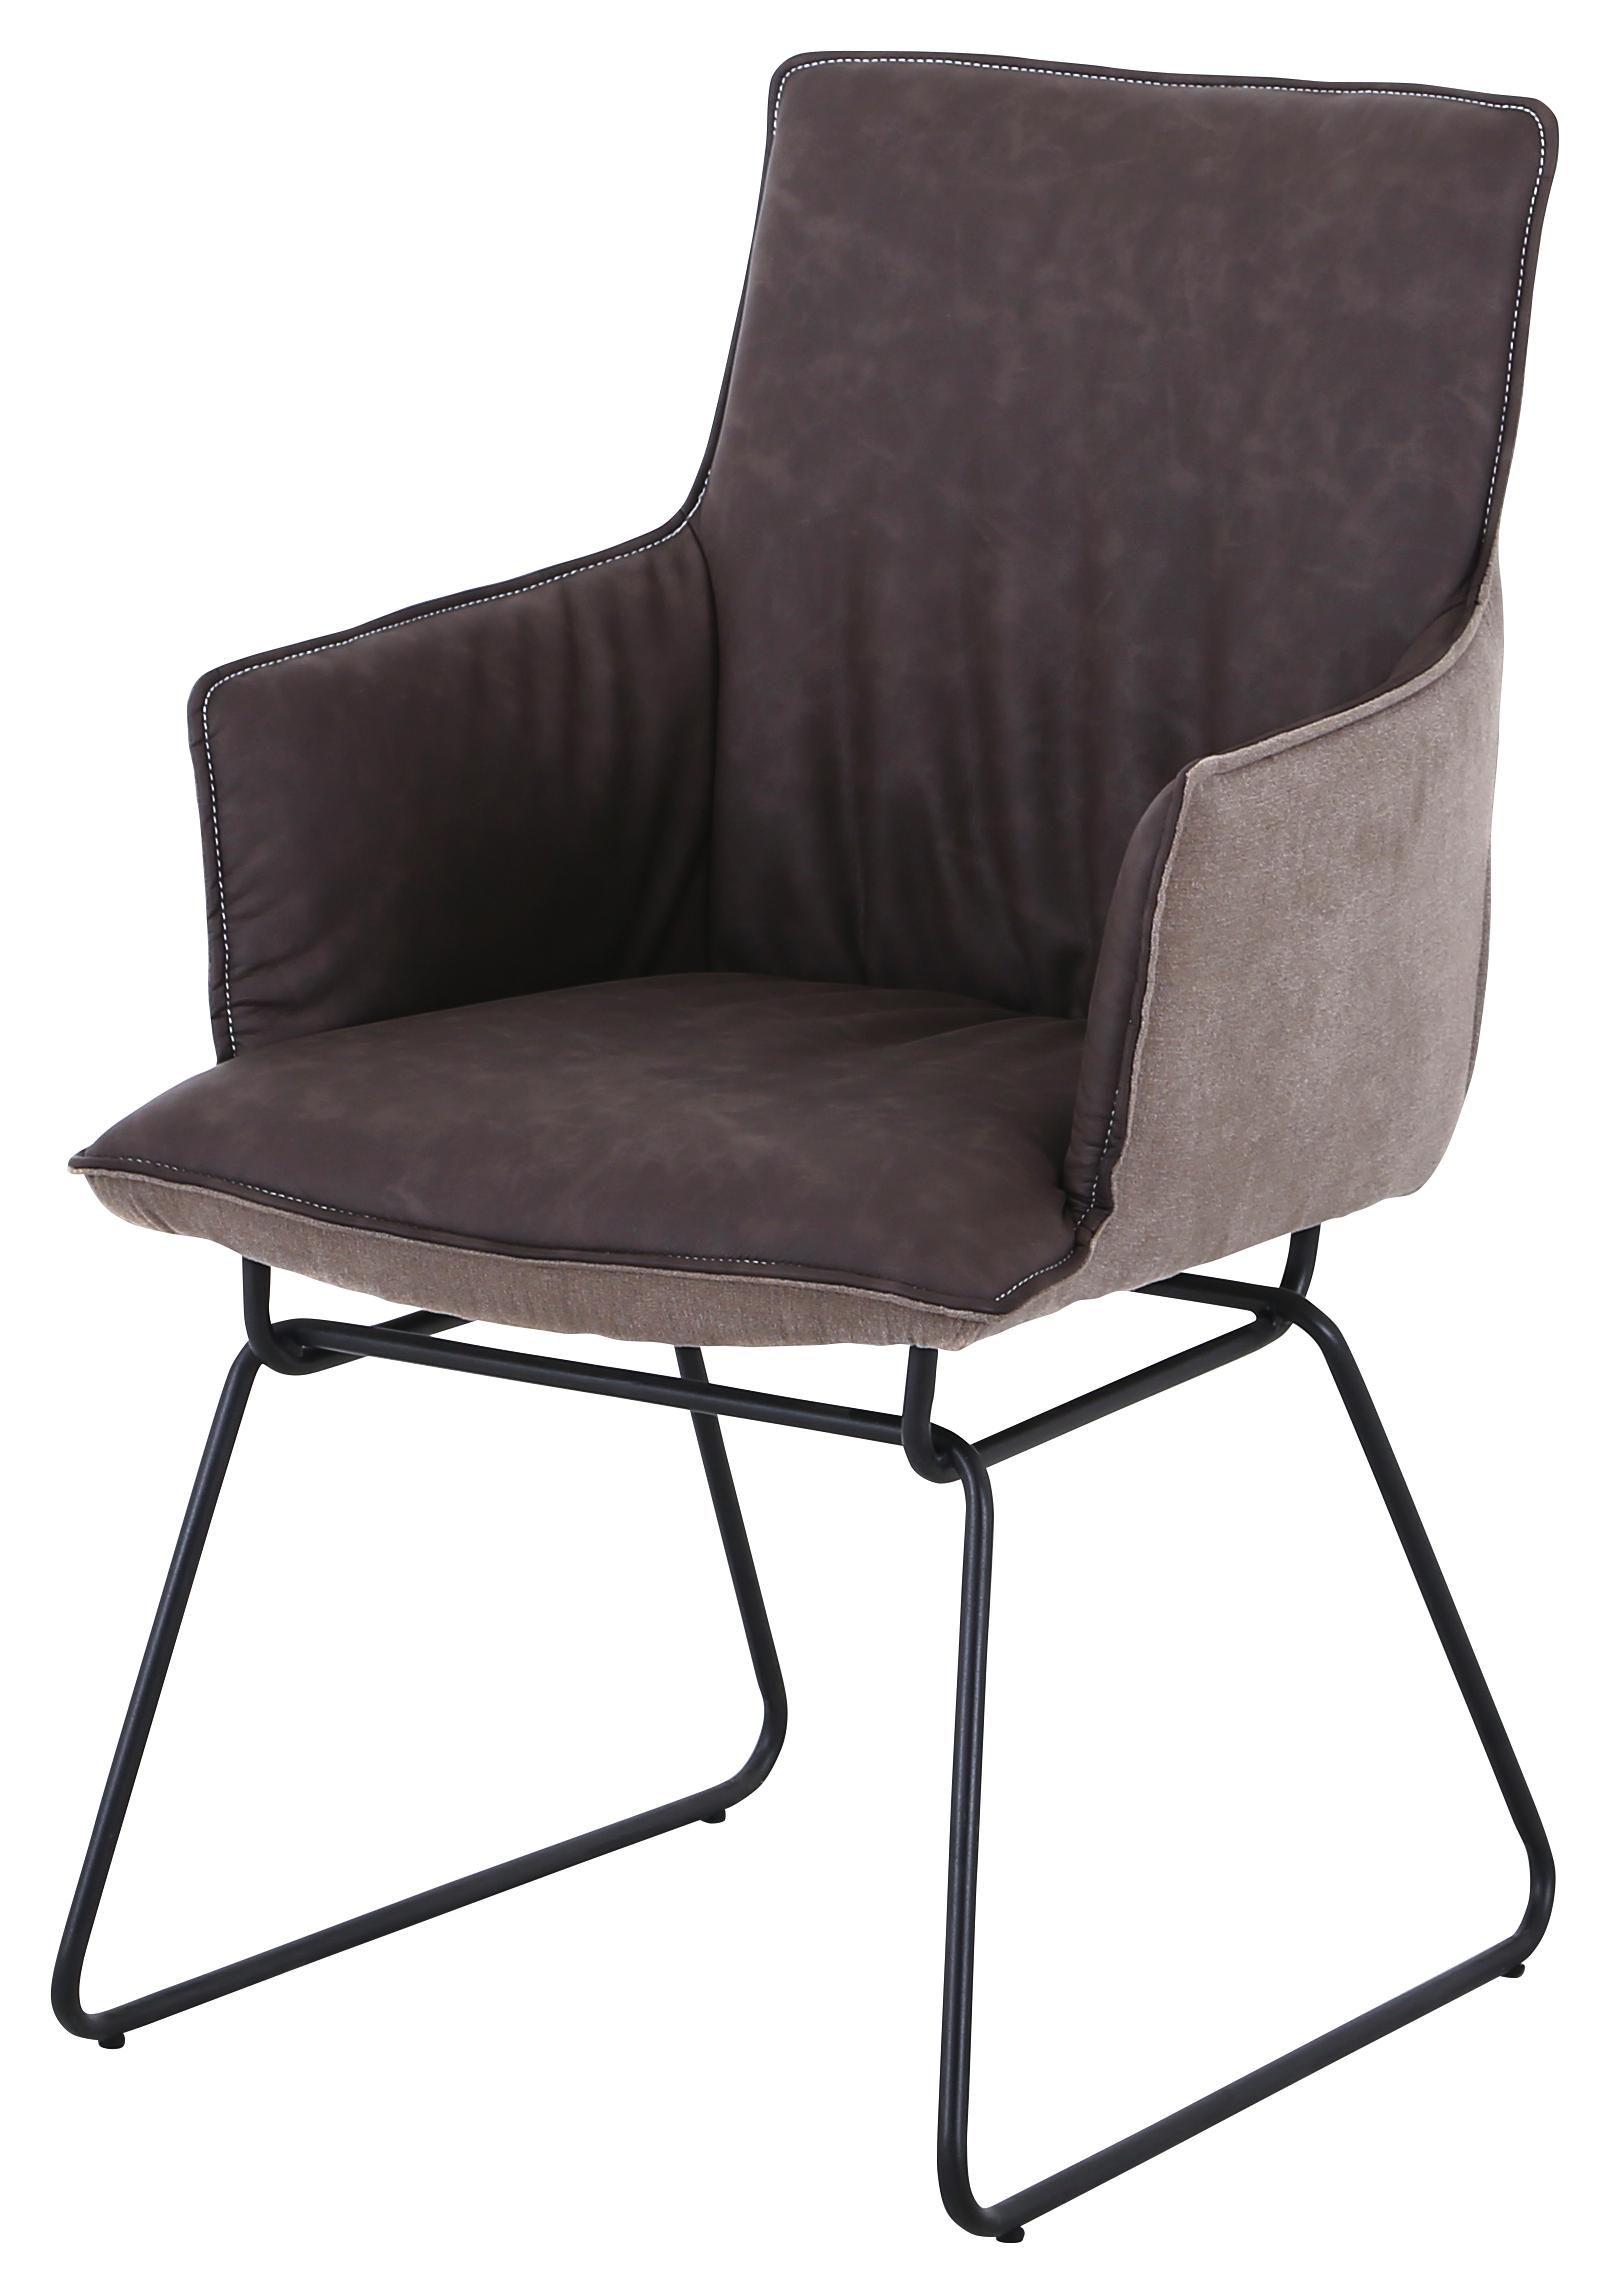 STOL, kovina, tekstil rjava - krom/rjava, Design, kovina/tekstil (57/89/65cm) - Carryhome